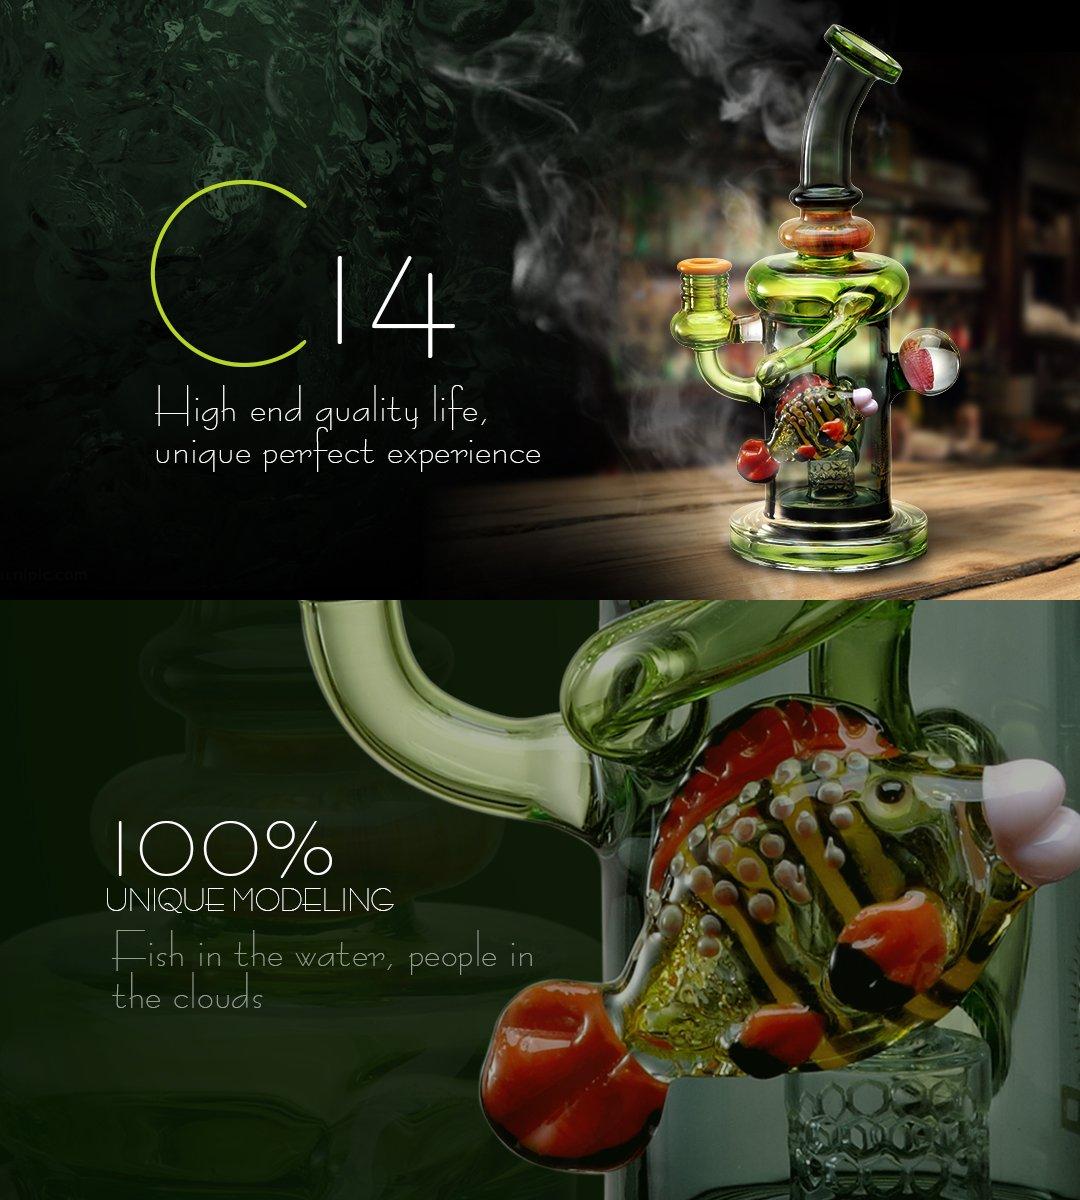 C14 Glass Bong